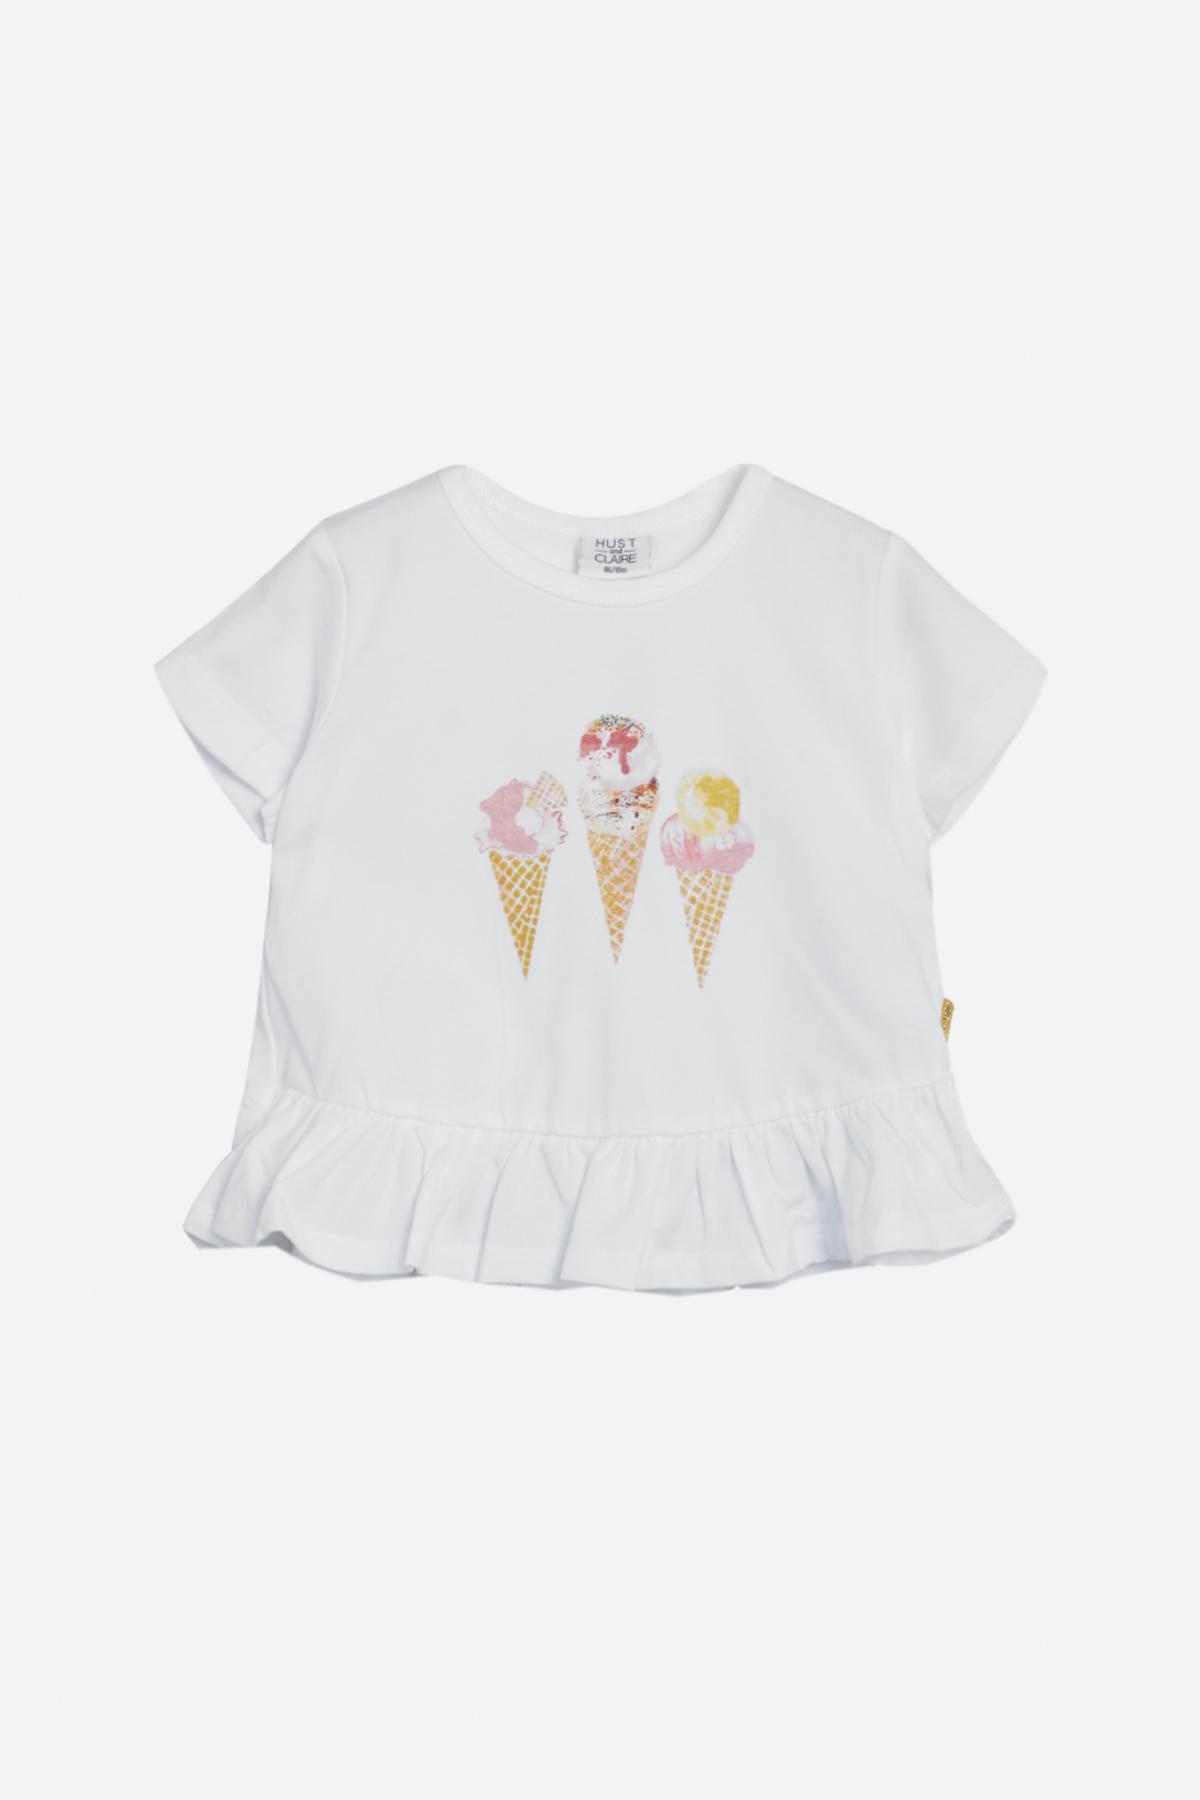 Hust & Claire Athena t-shirt, hvid, 98